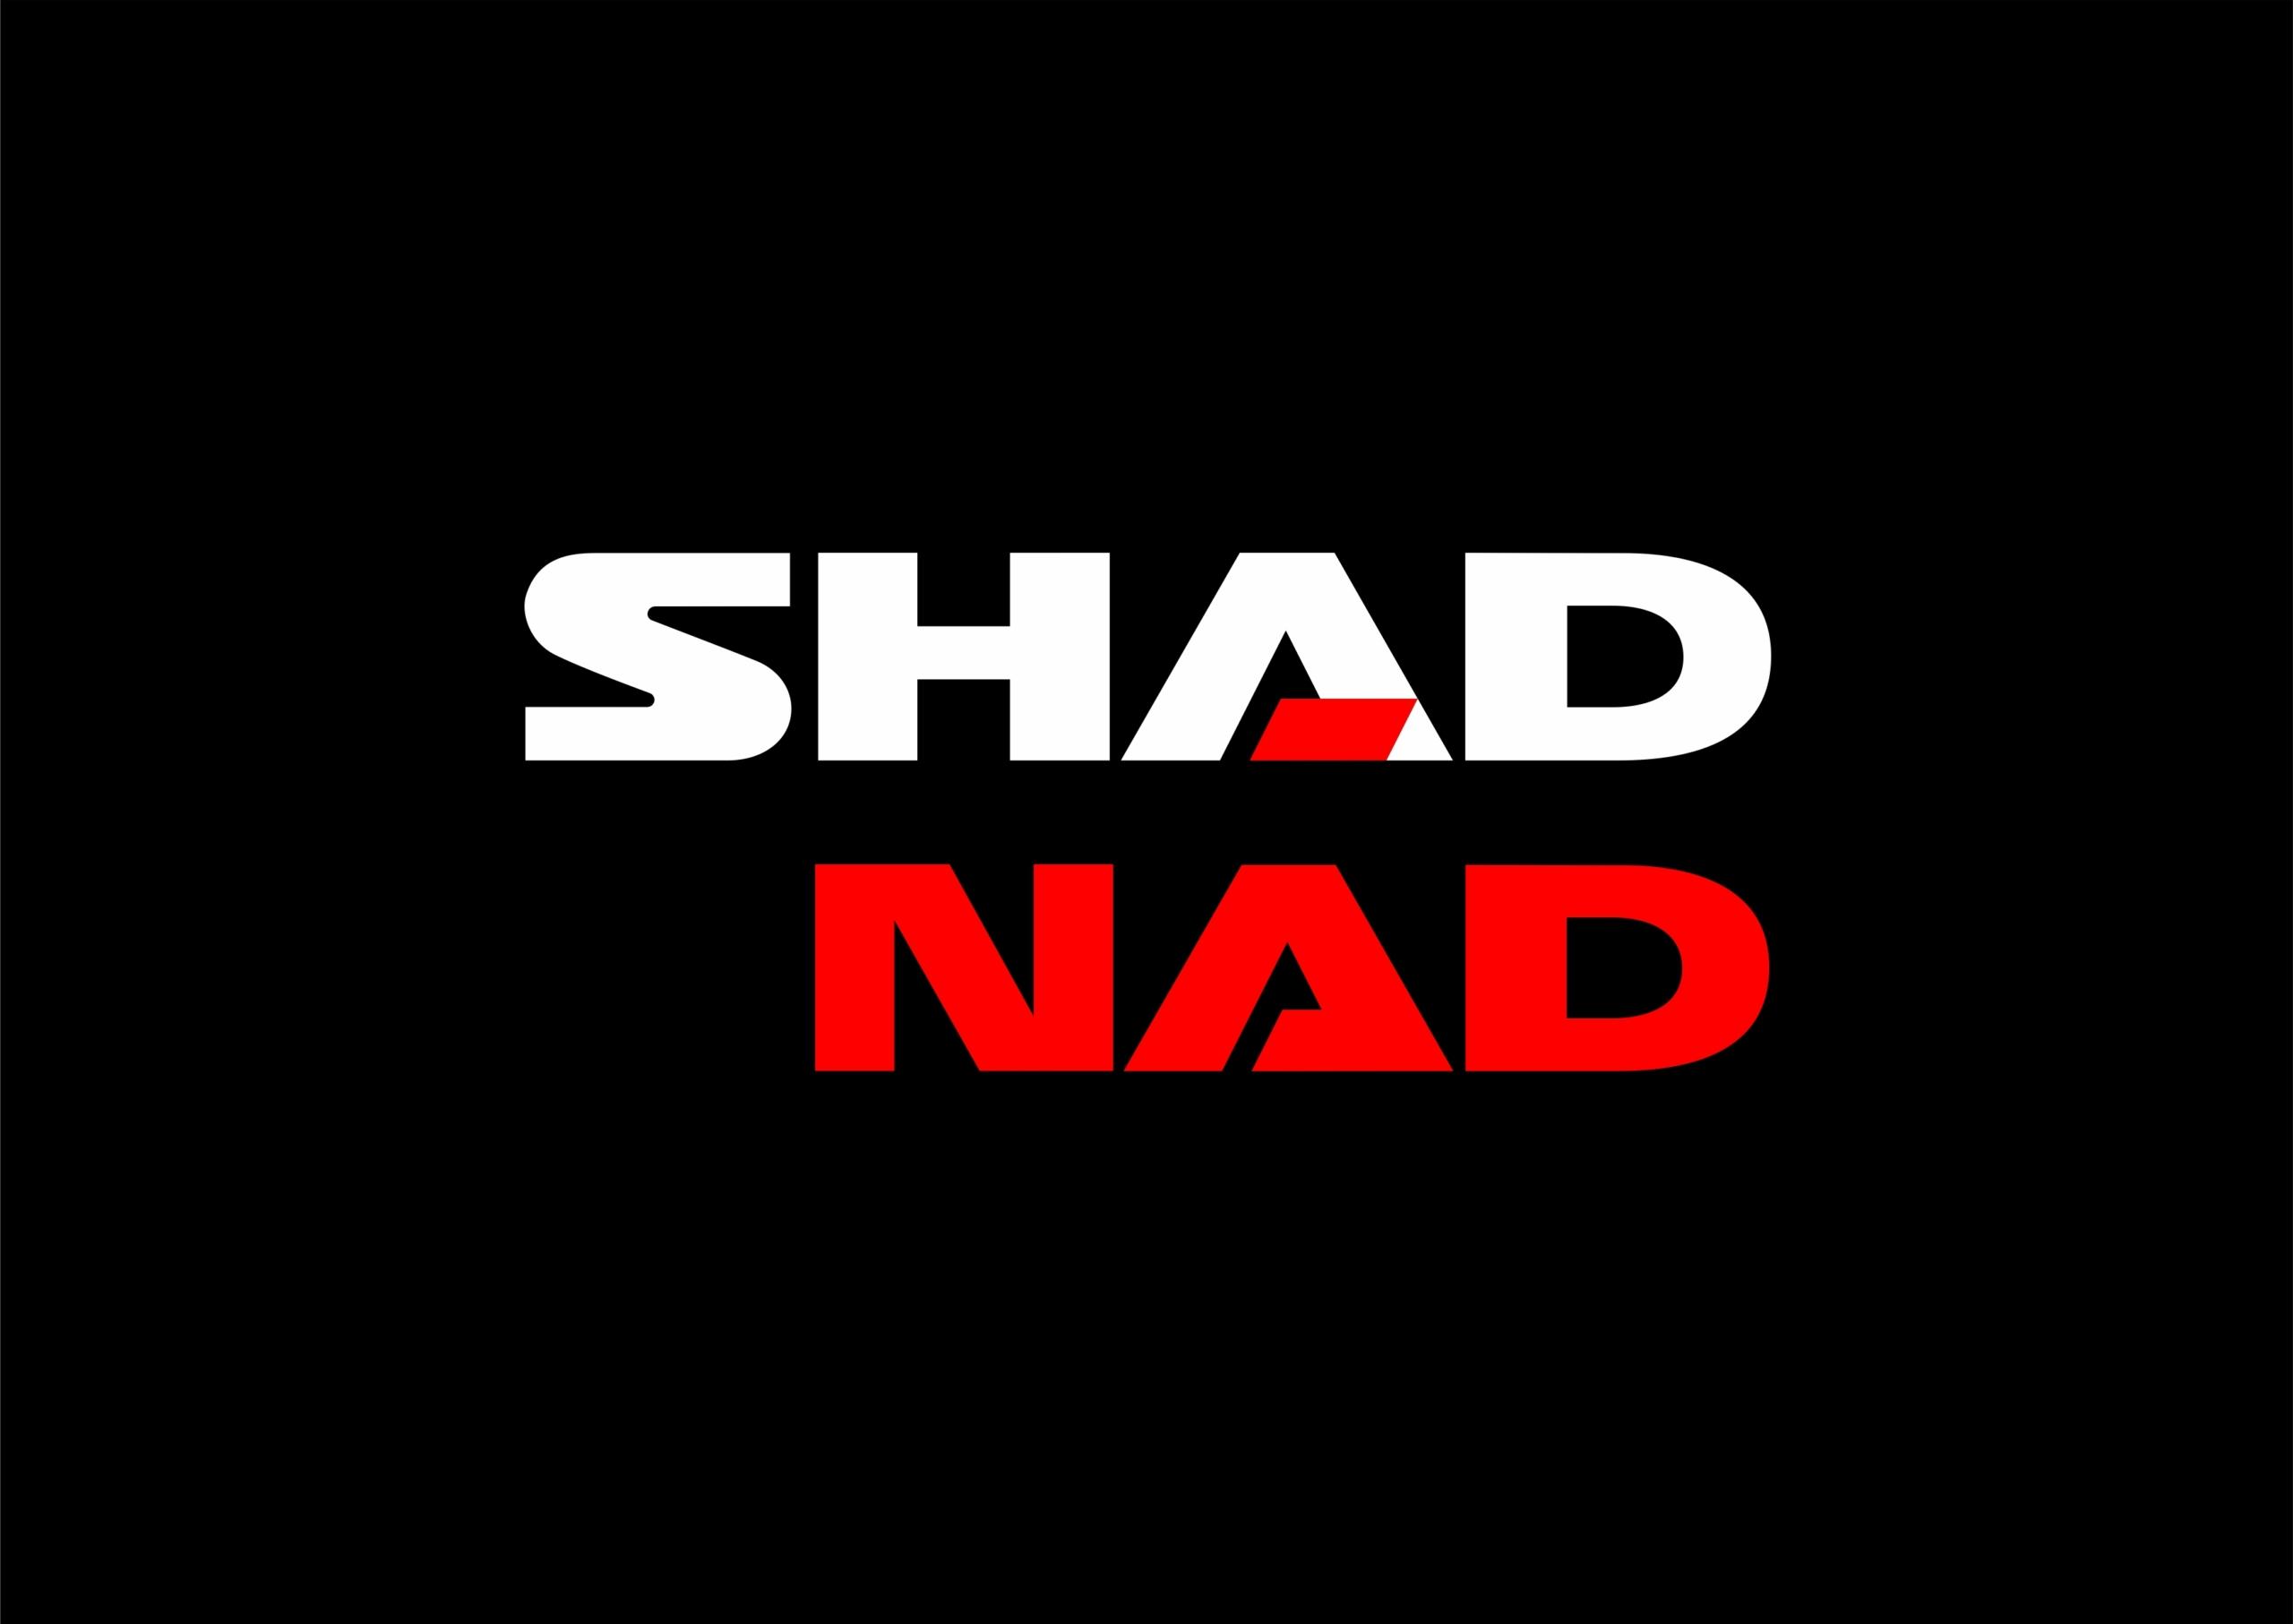 SHADNAD